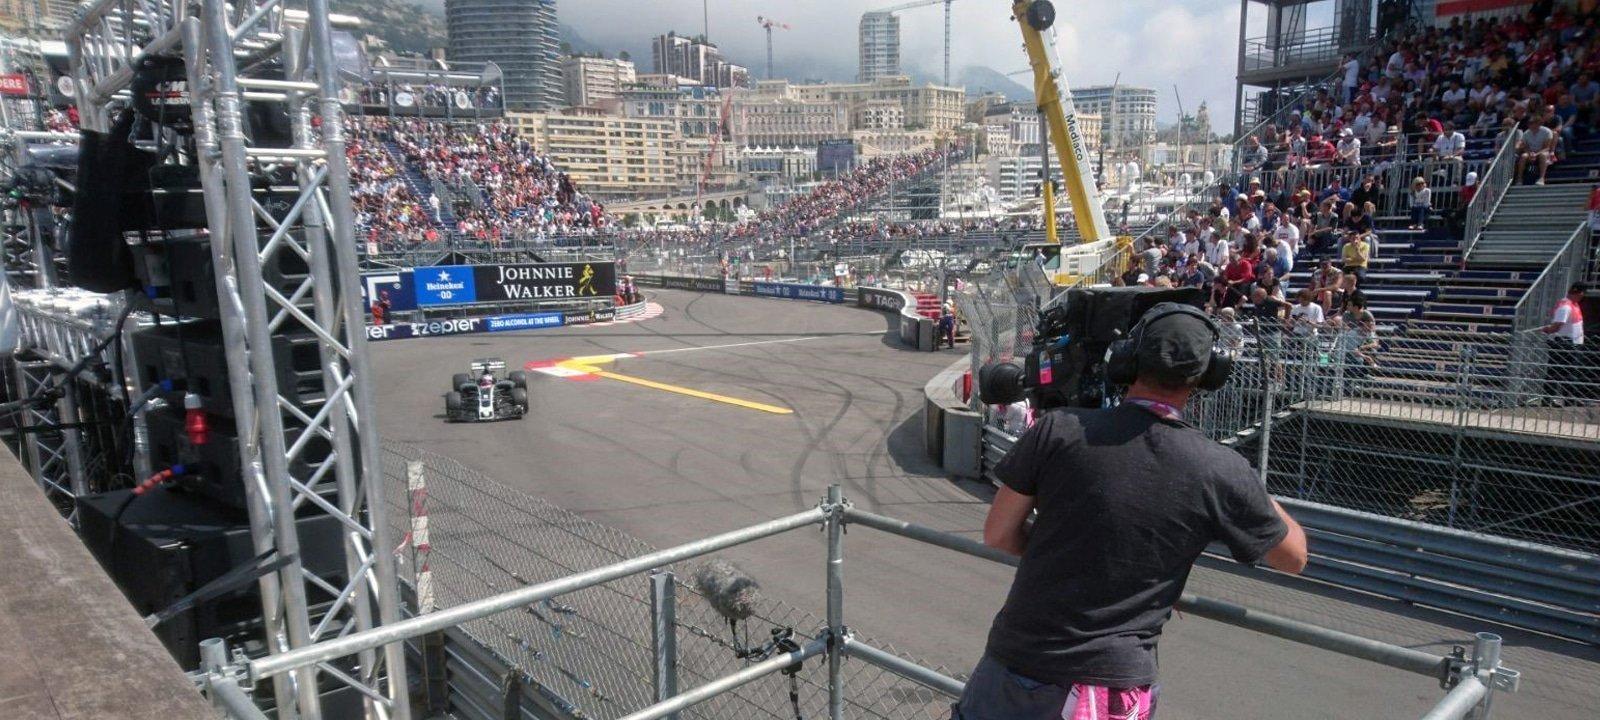 ES Broadcast Hire's 4K Cameras and Lenses in use at the F1 Monaco Grand Prix